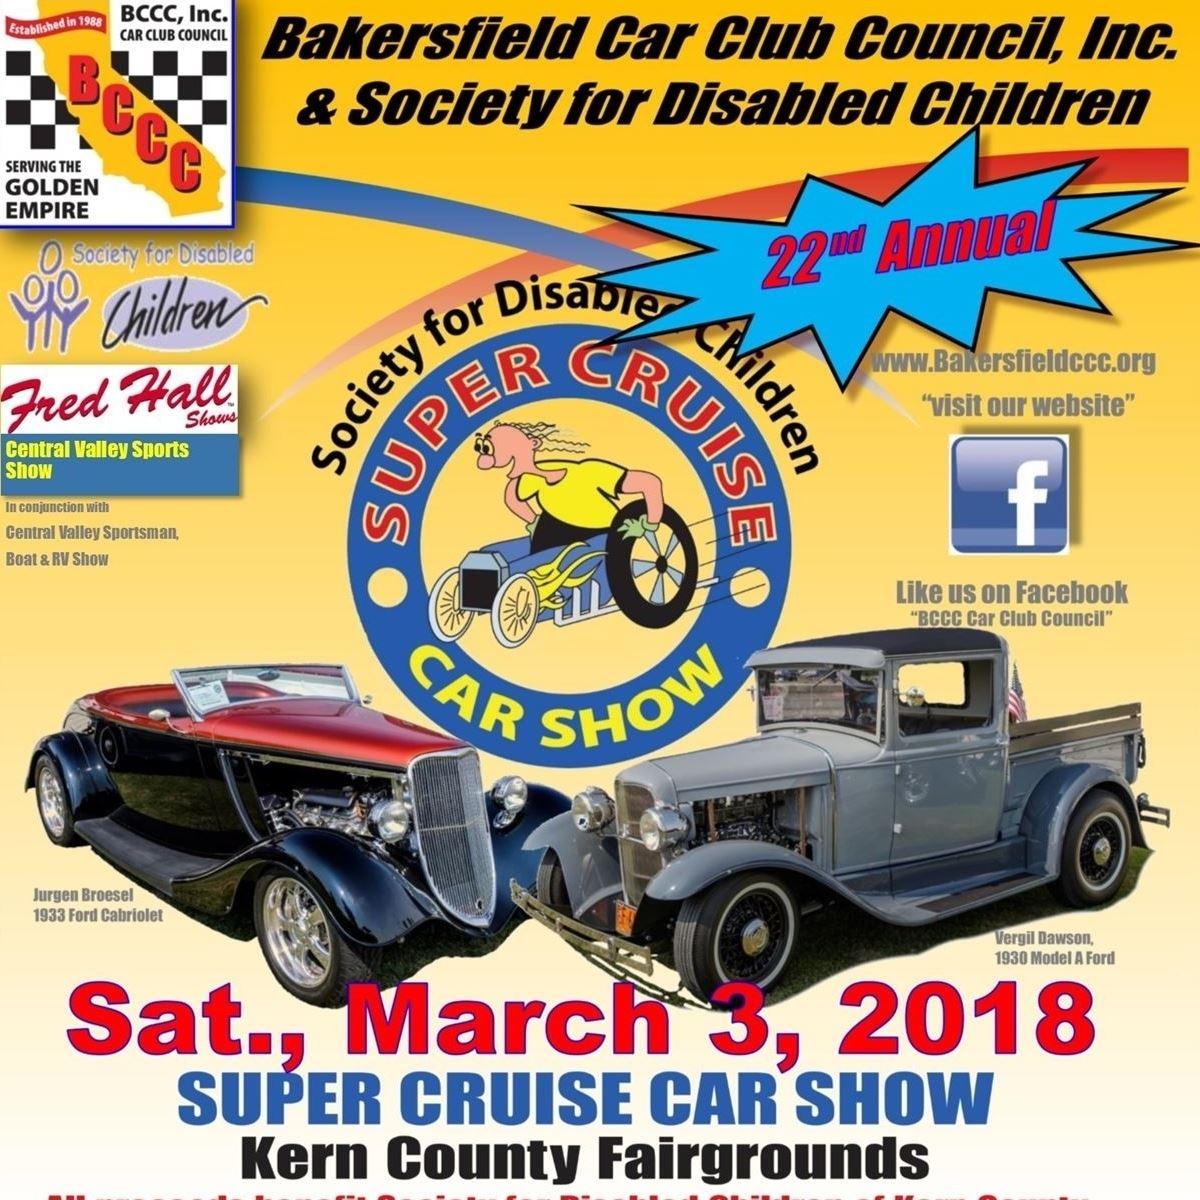 Super Cruise Car Show - Bakersfield car show